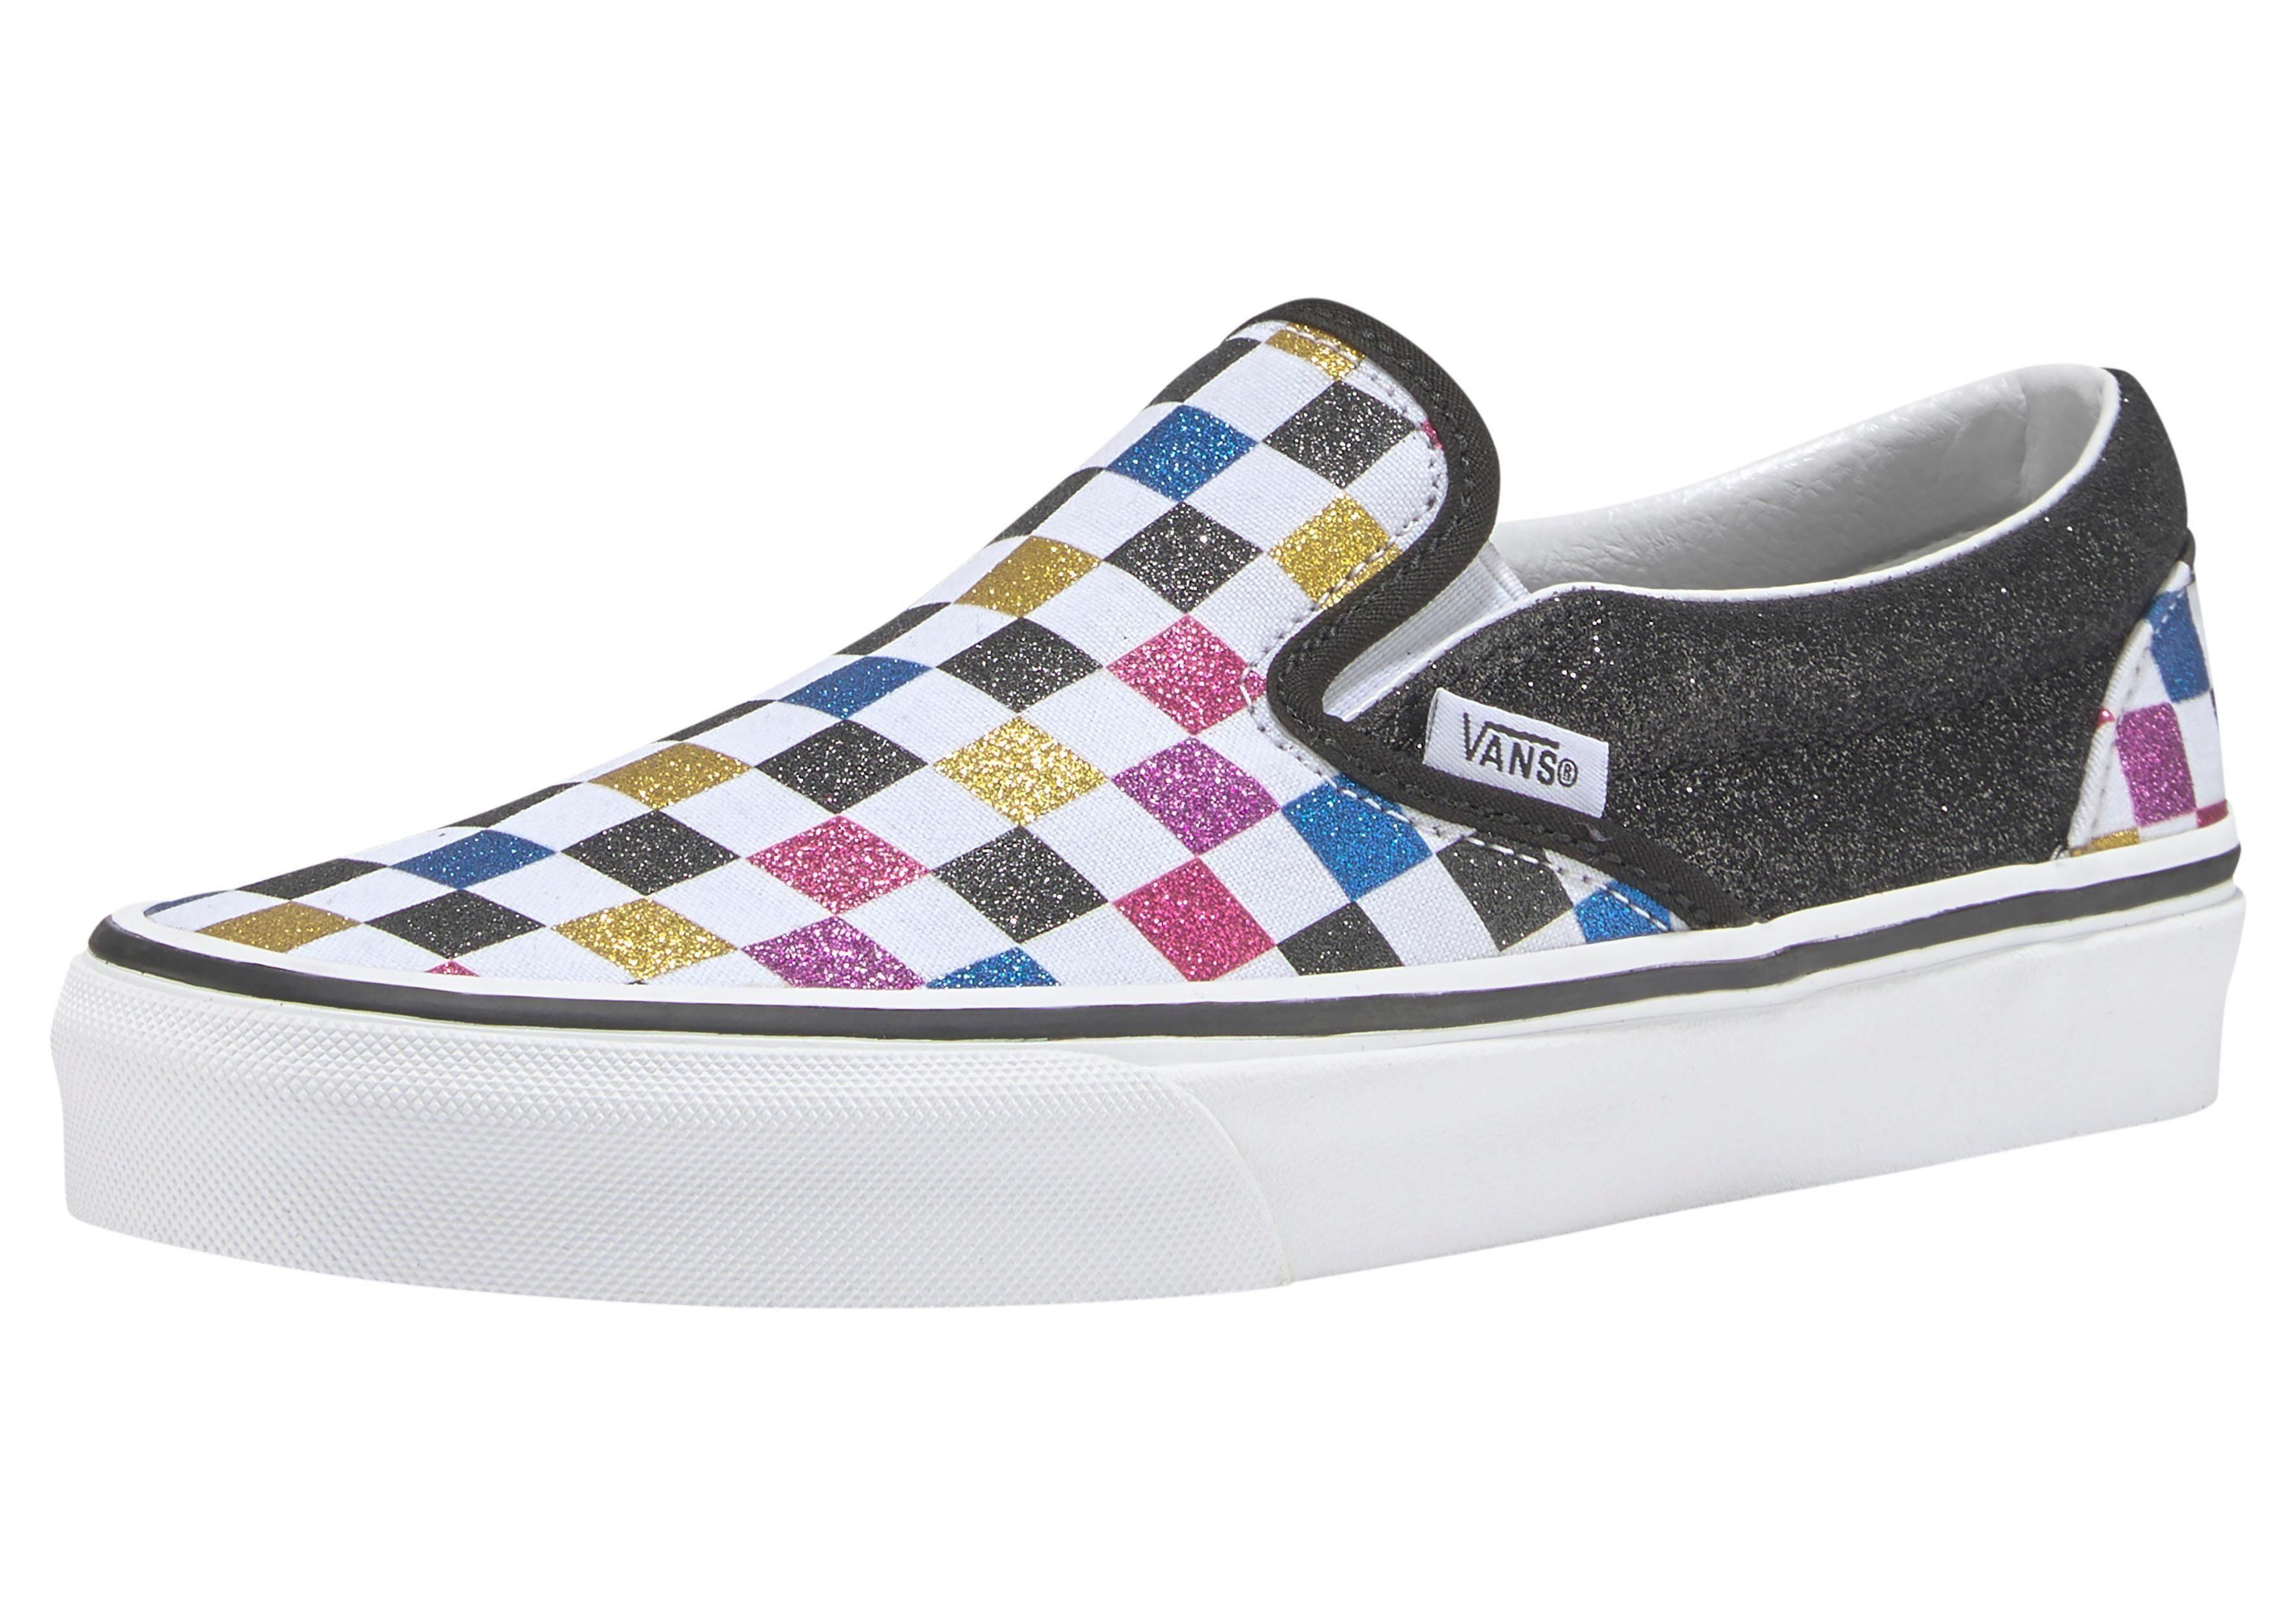 Vans »Classic Slip On Checkerboard« Sneaker kaufen | OTTO